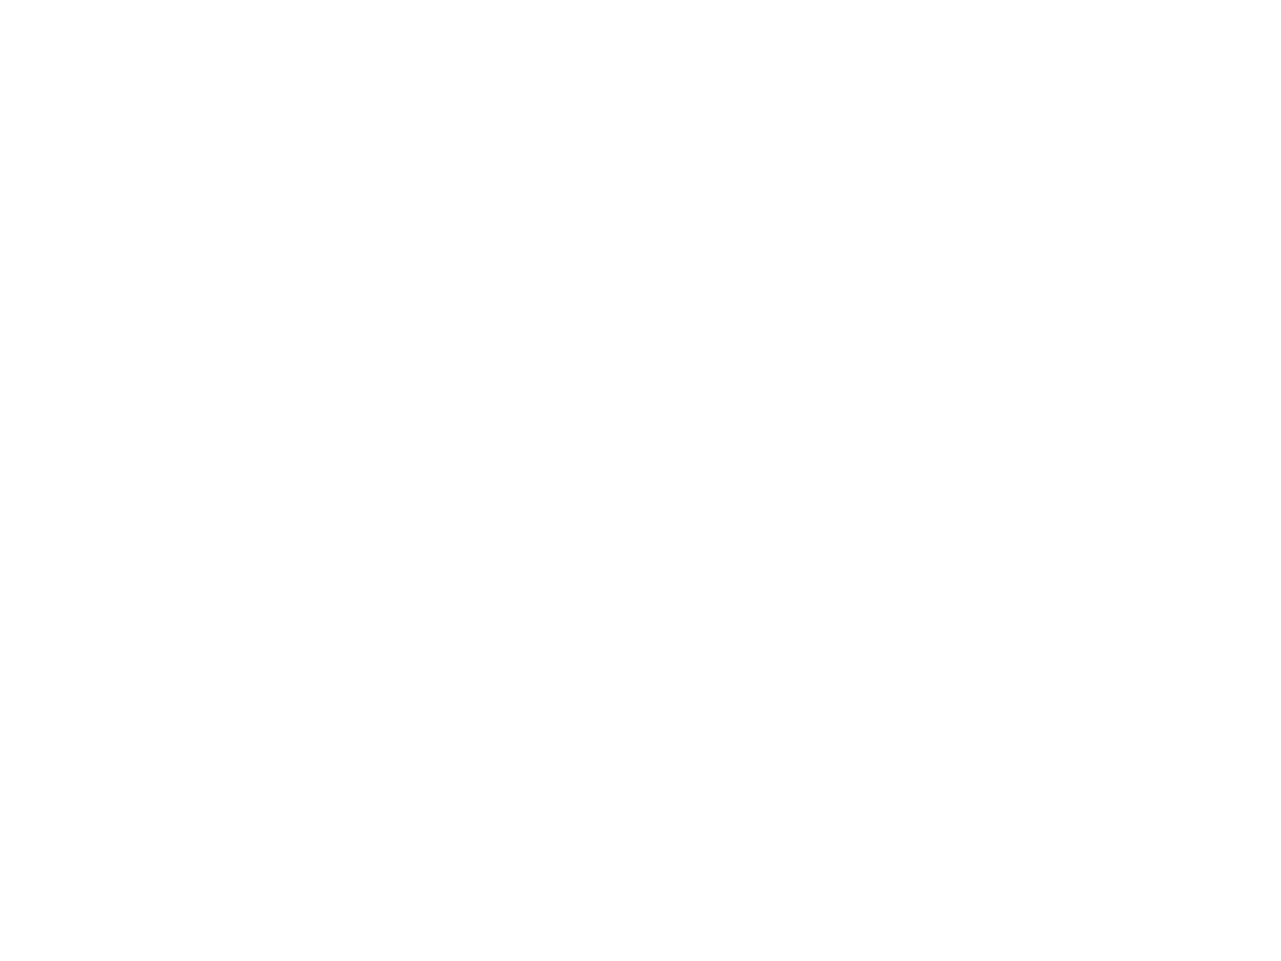 Quokka a Rottnest Island, Western Australia.